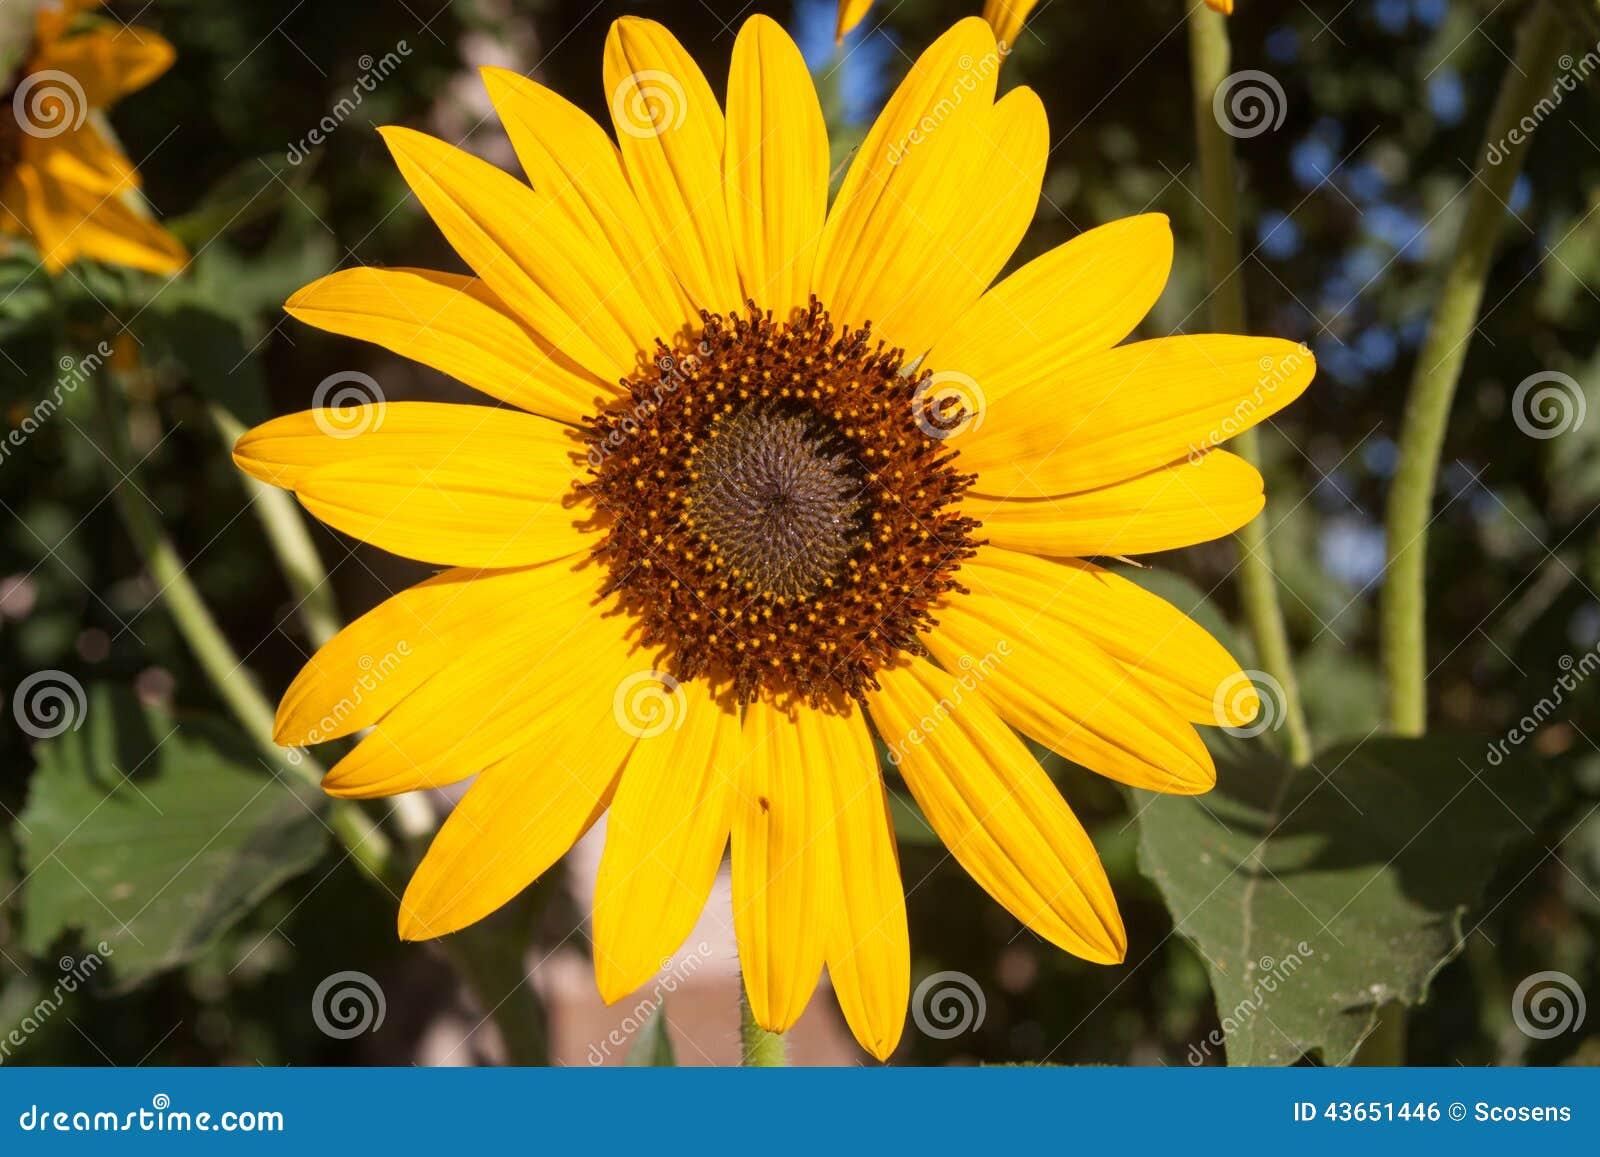 single women in sunflower Sunflowerinlove - single woman seeking match in paintsville, kentucky, united states 26 yo zodiac sign: taurus contact kentucky woman sunflowerinlove for online relations my name is.